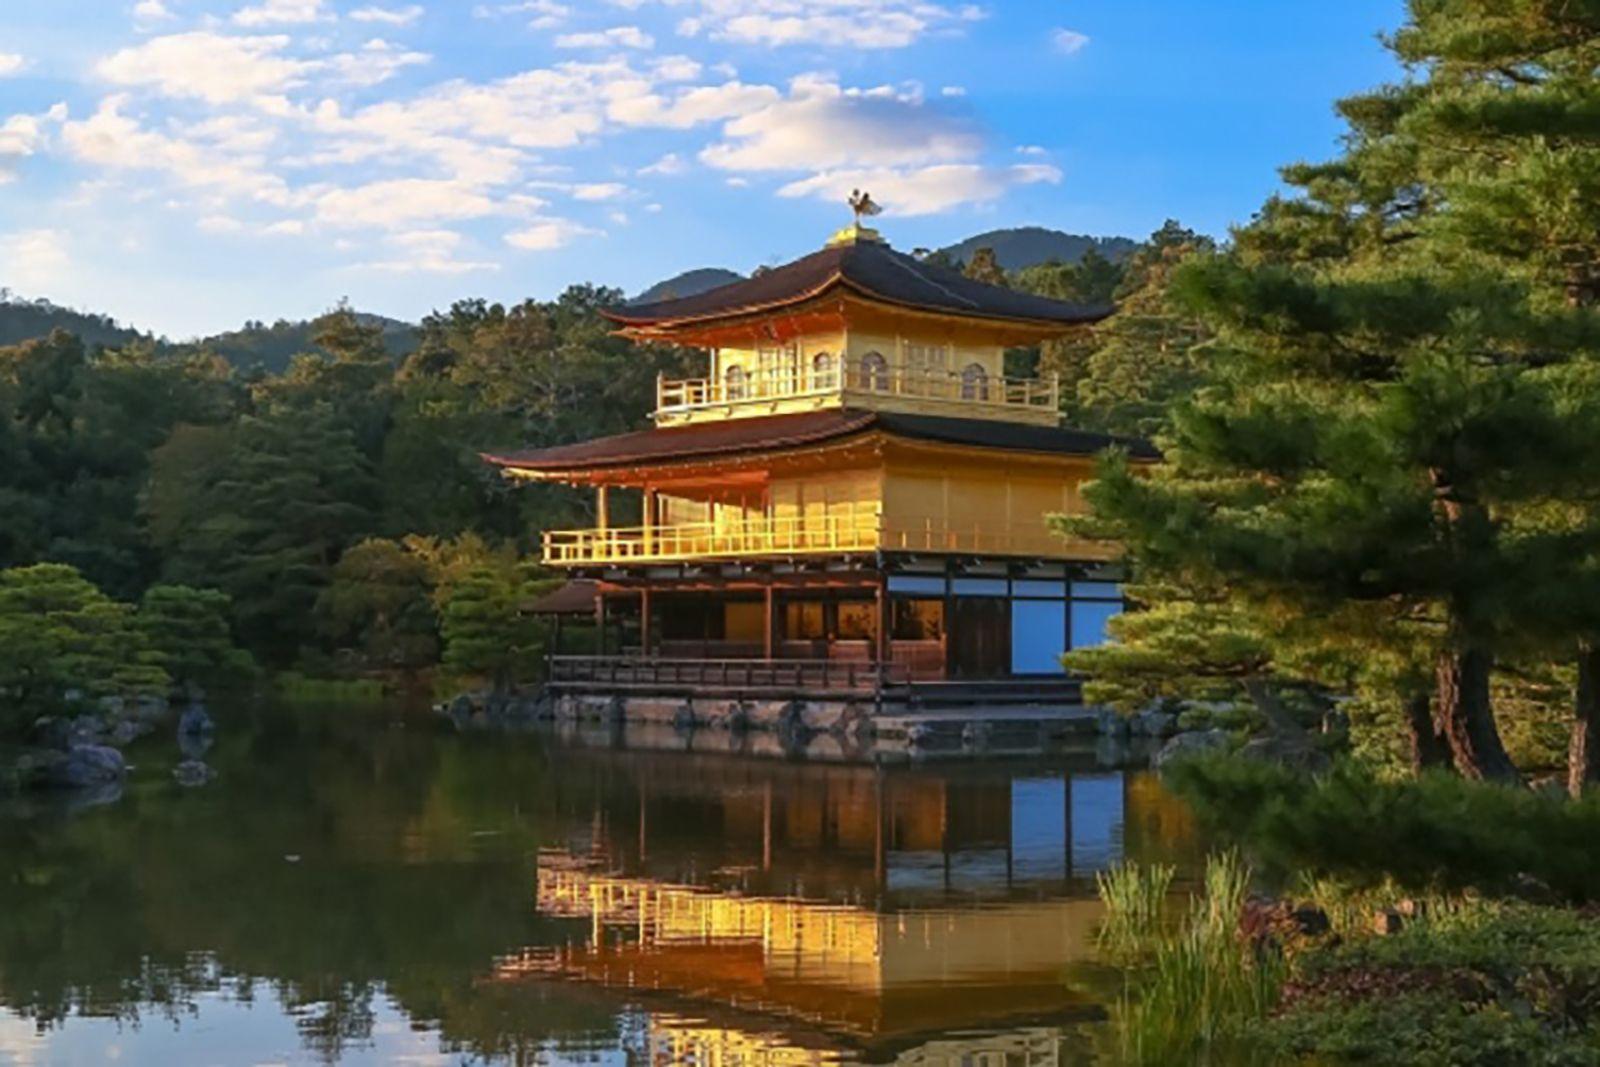 Kyoto Arashiyama and Nara 1 Day Bus Tour